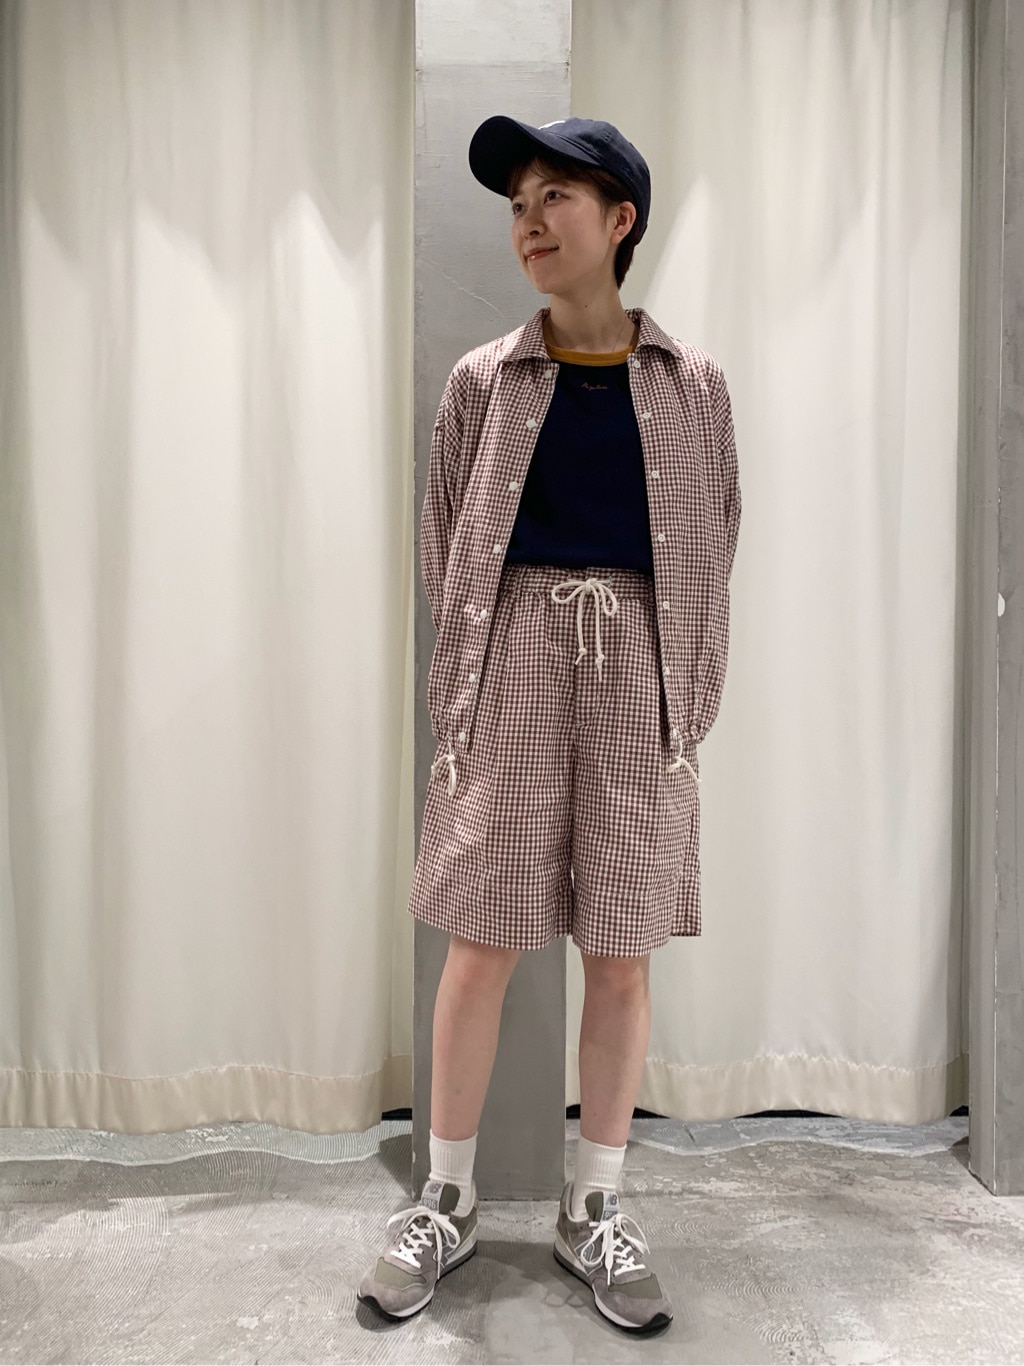 - CHILD WOMAN CHILD WOMAN , PAR ICI ルミネ横浜 身長:158cm 2021.05.19